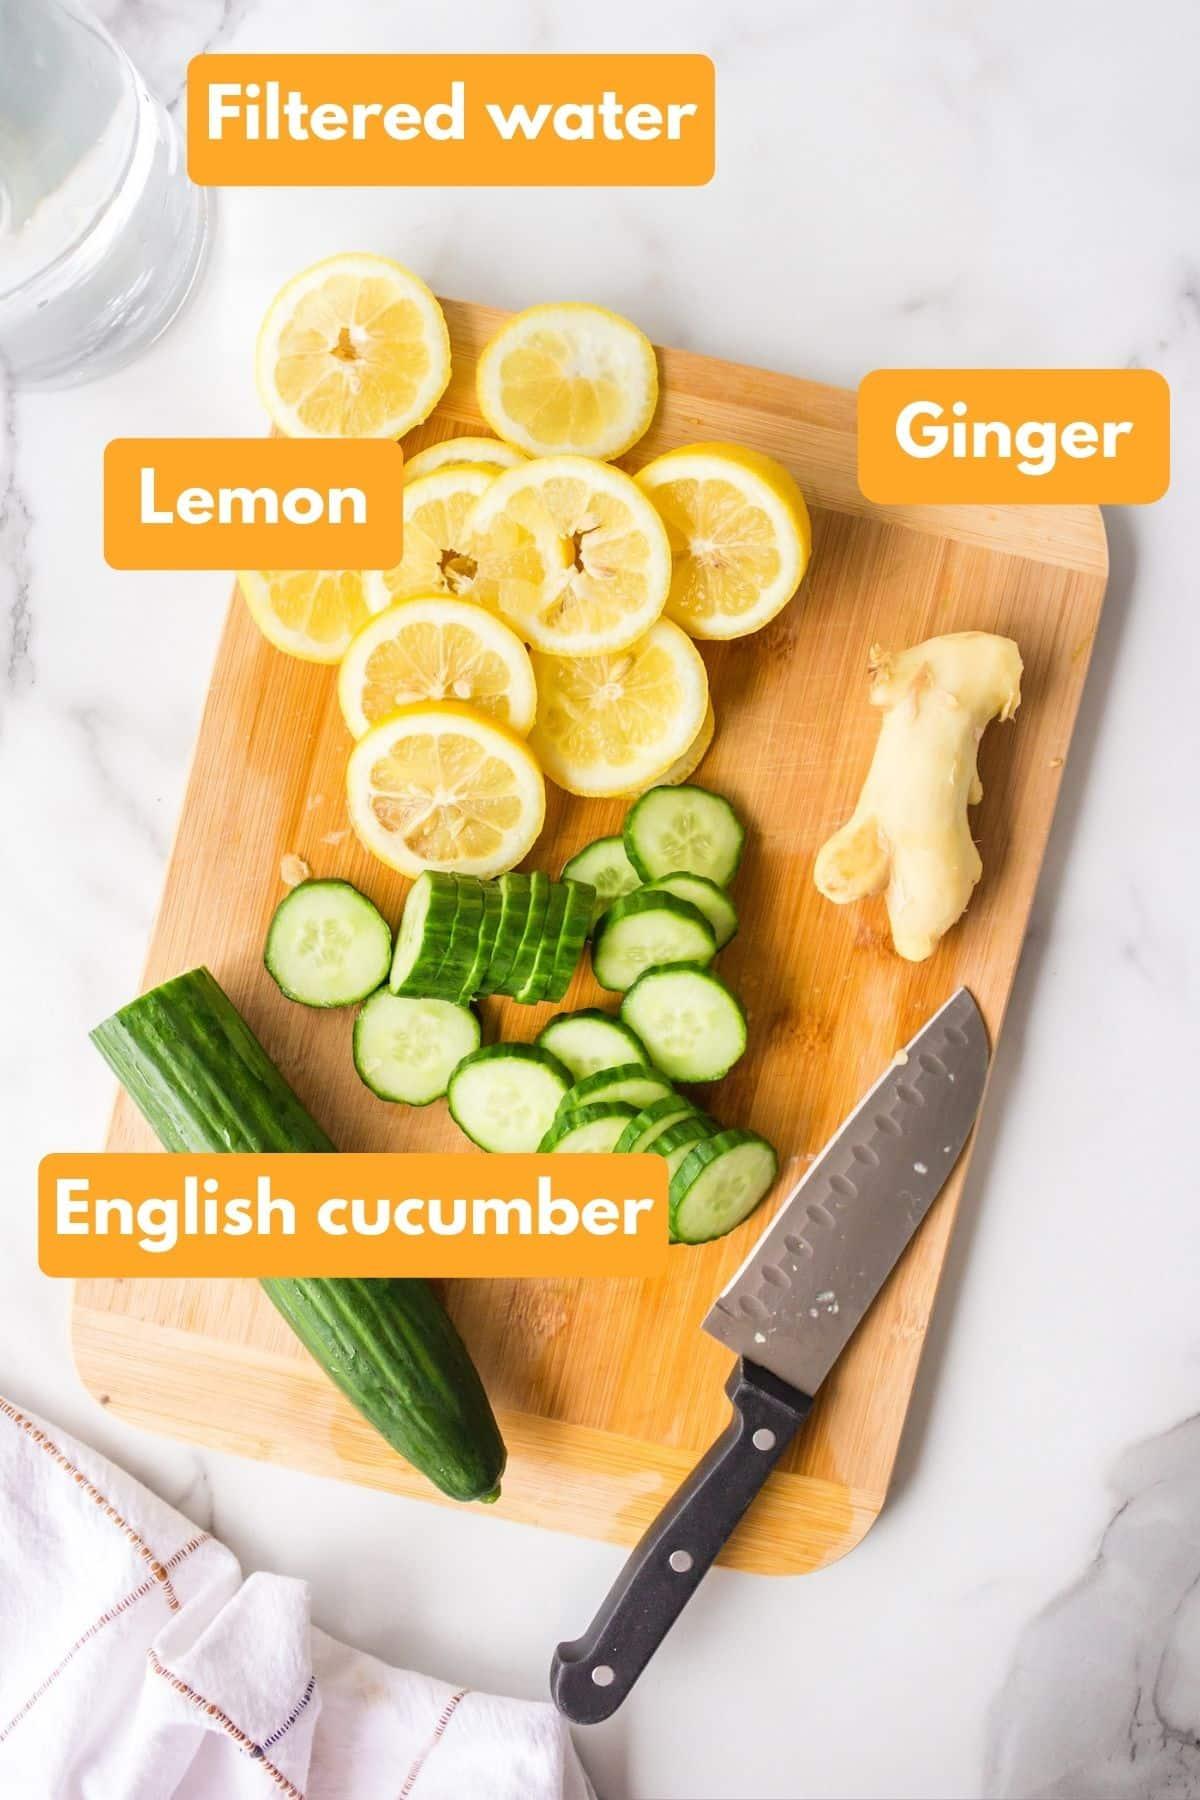 Ingredients for cucumber lemon ginger water